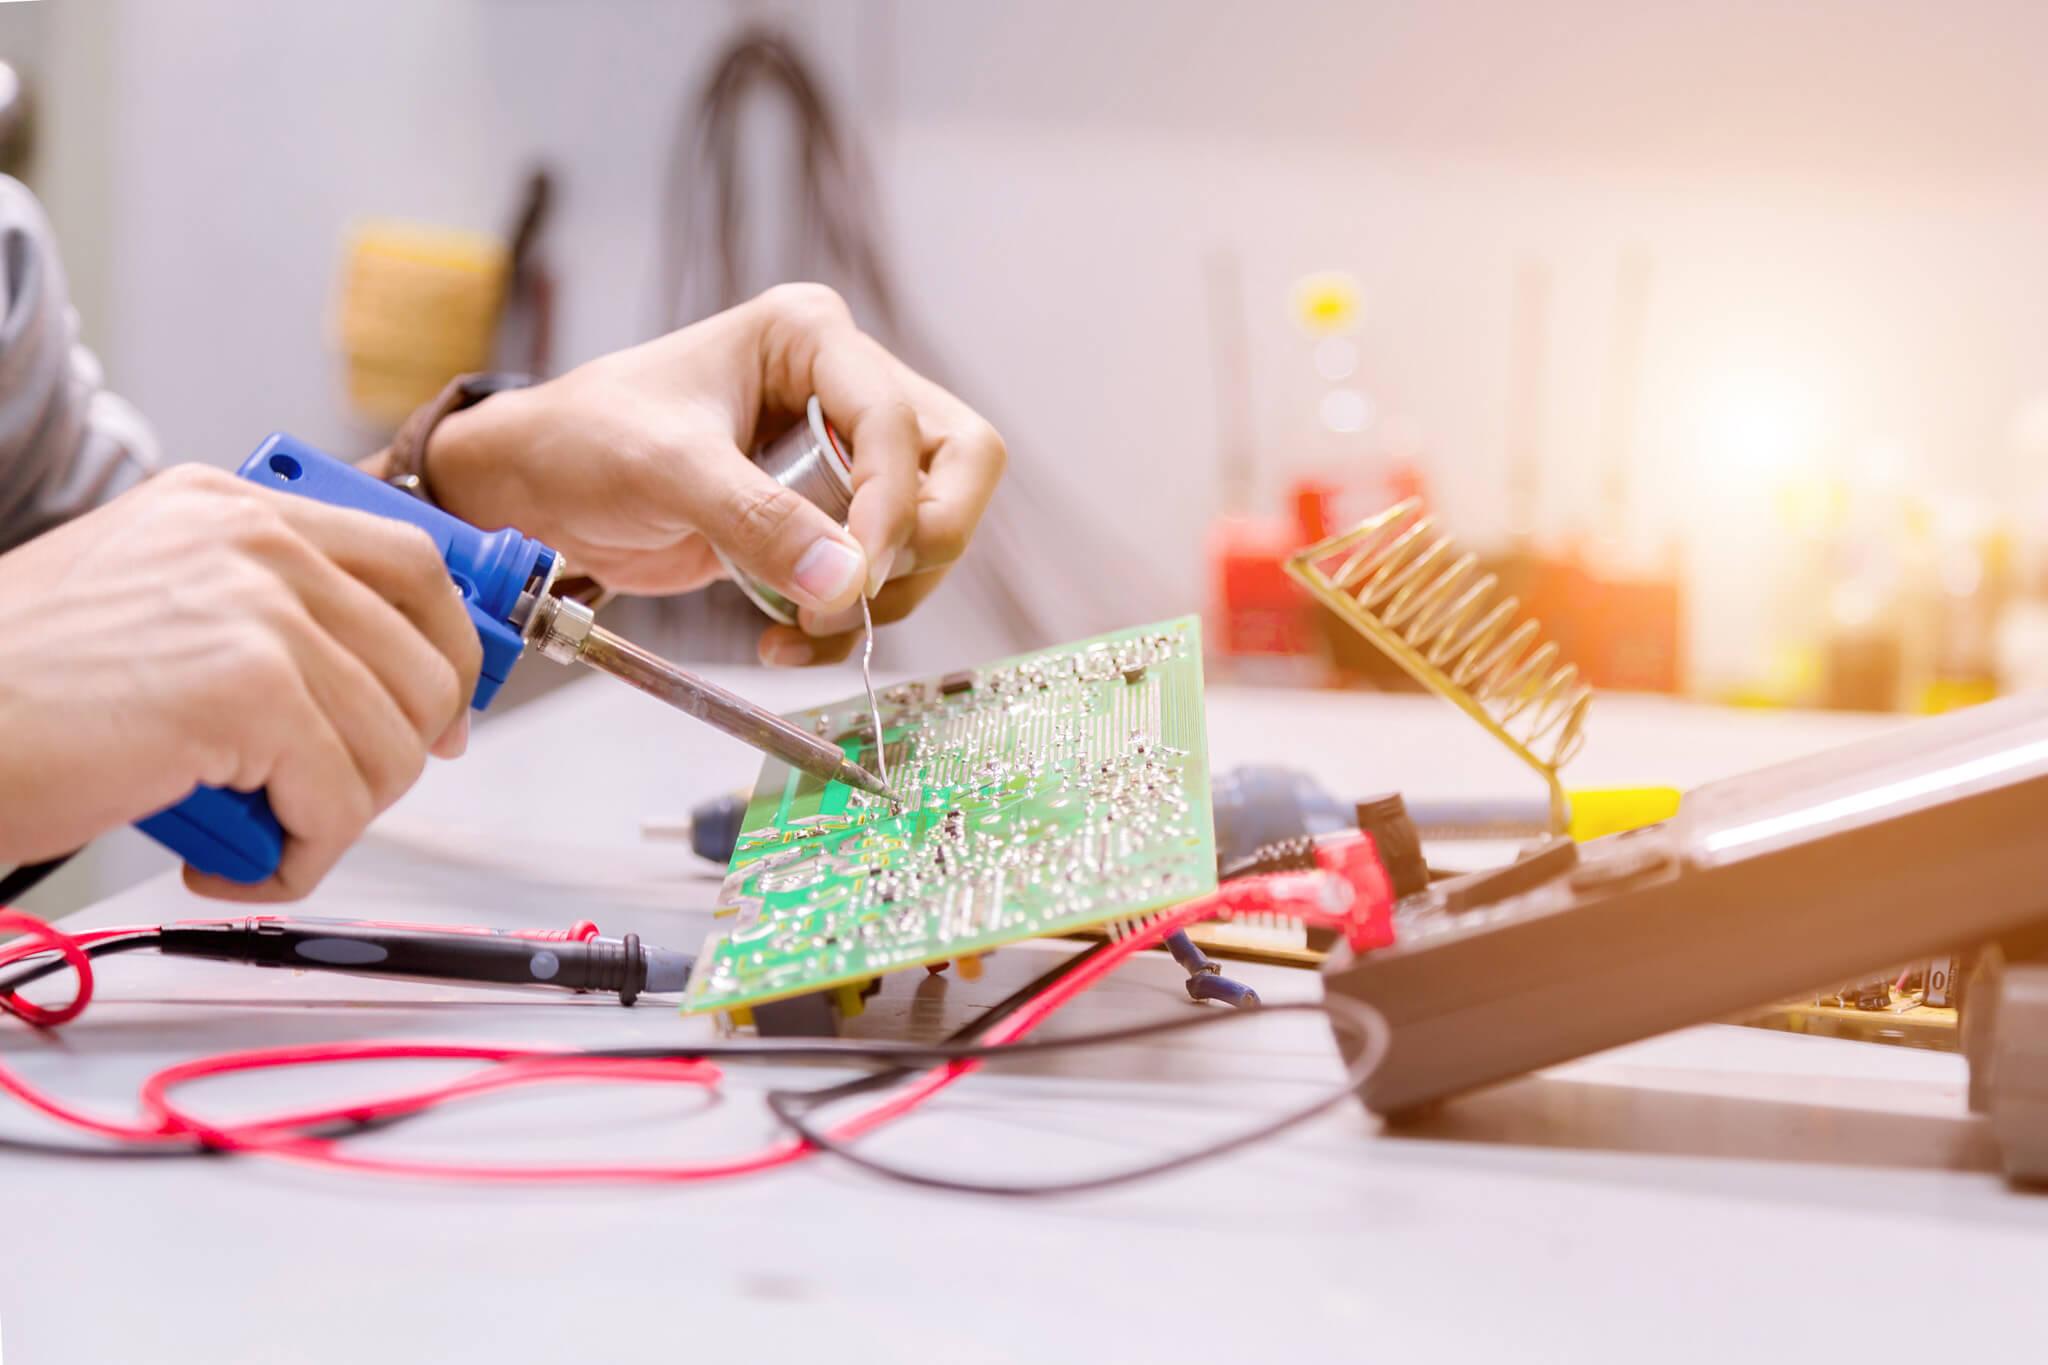 Senior Electro-Mechanical Assembler